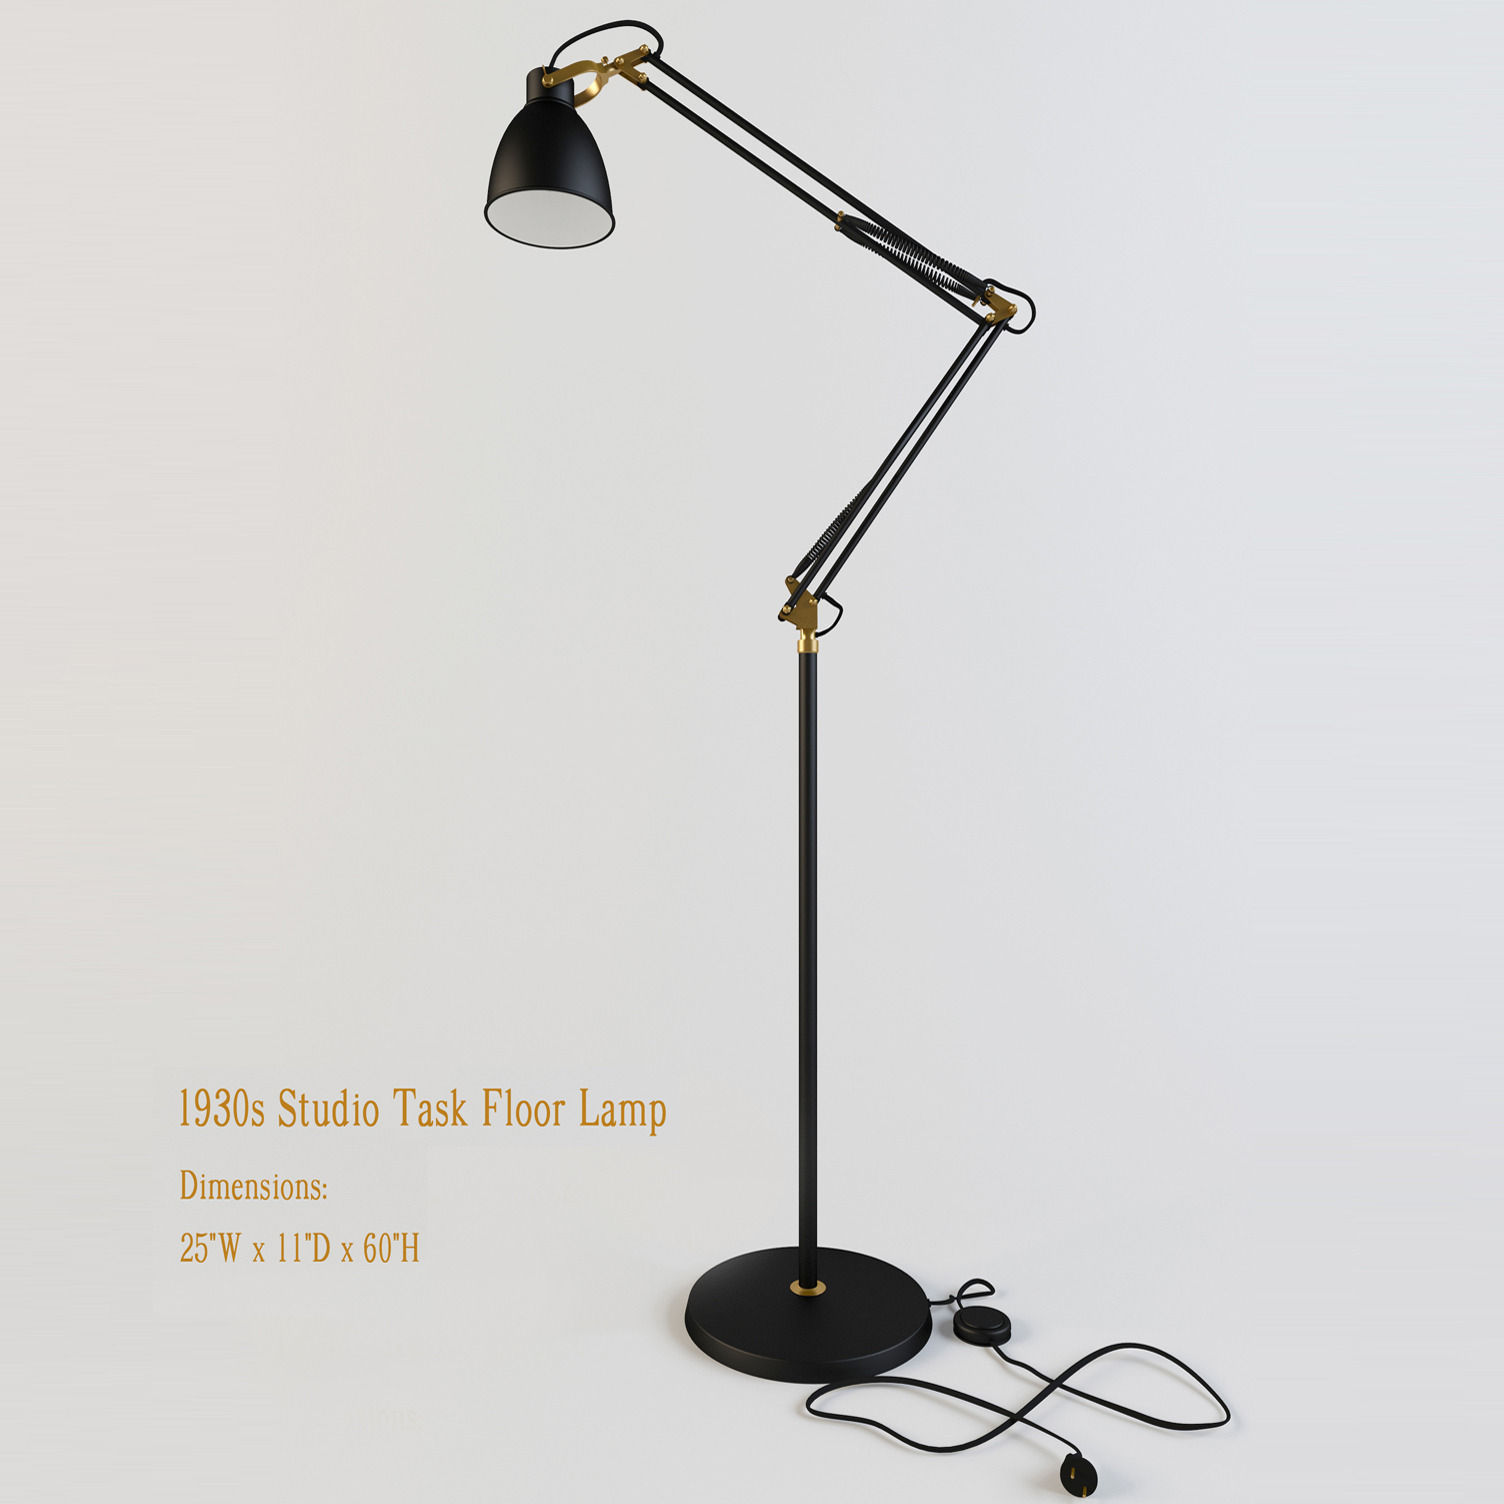 Restoration Hardware 1930s Studio Task Floor Lamp 3d Model Max Obj 3ds Mtl 1